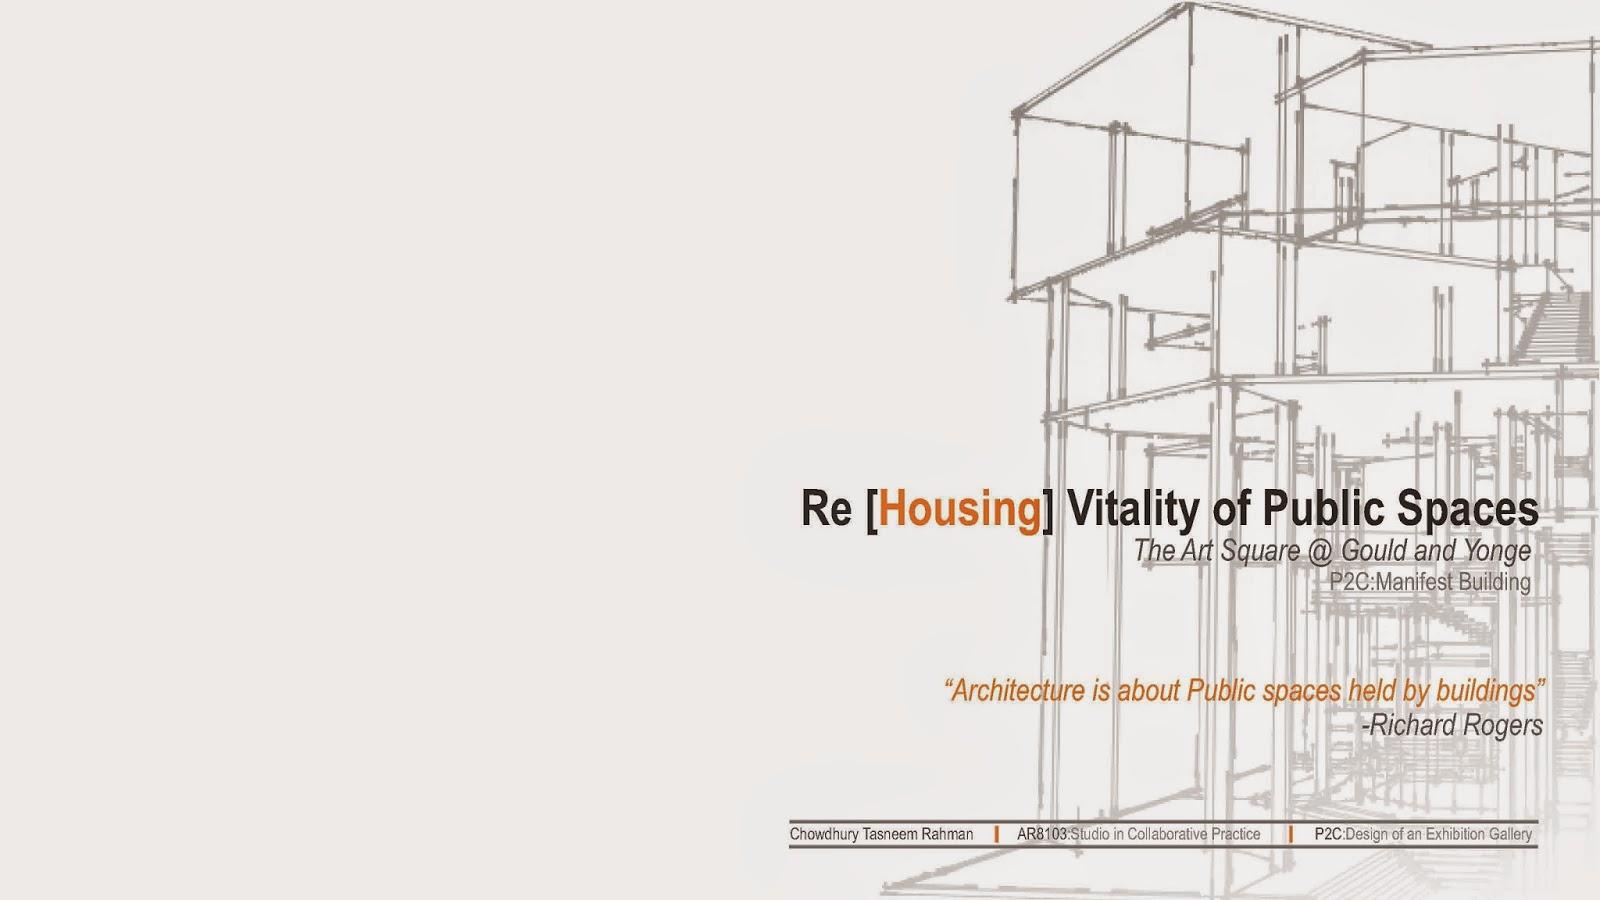 Ryerson Architecture Graduate Studio 2015: P2C final